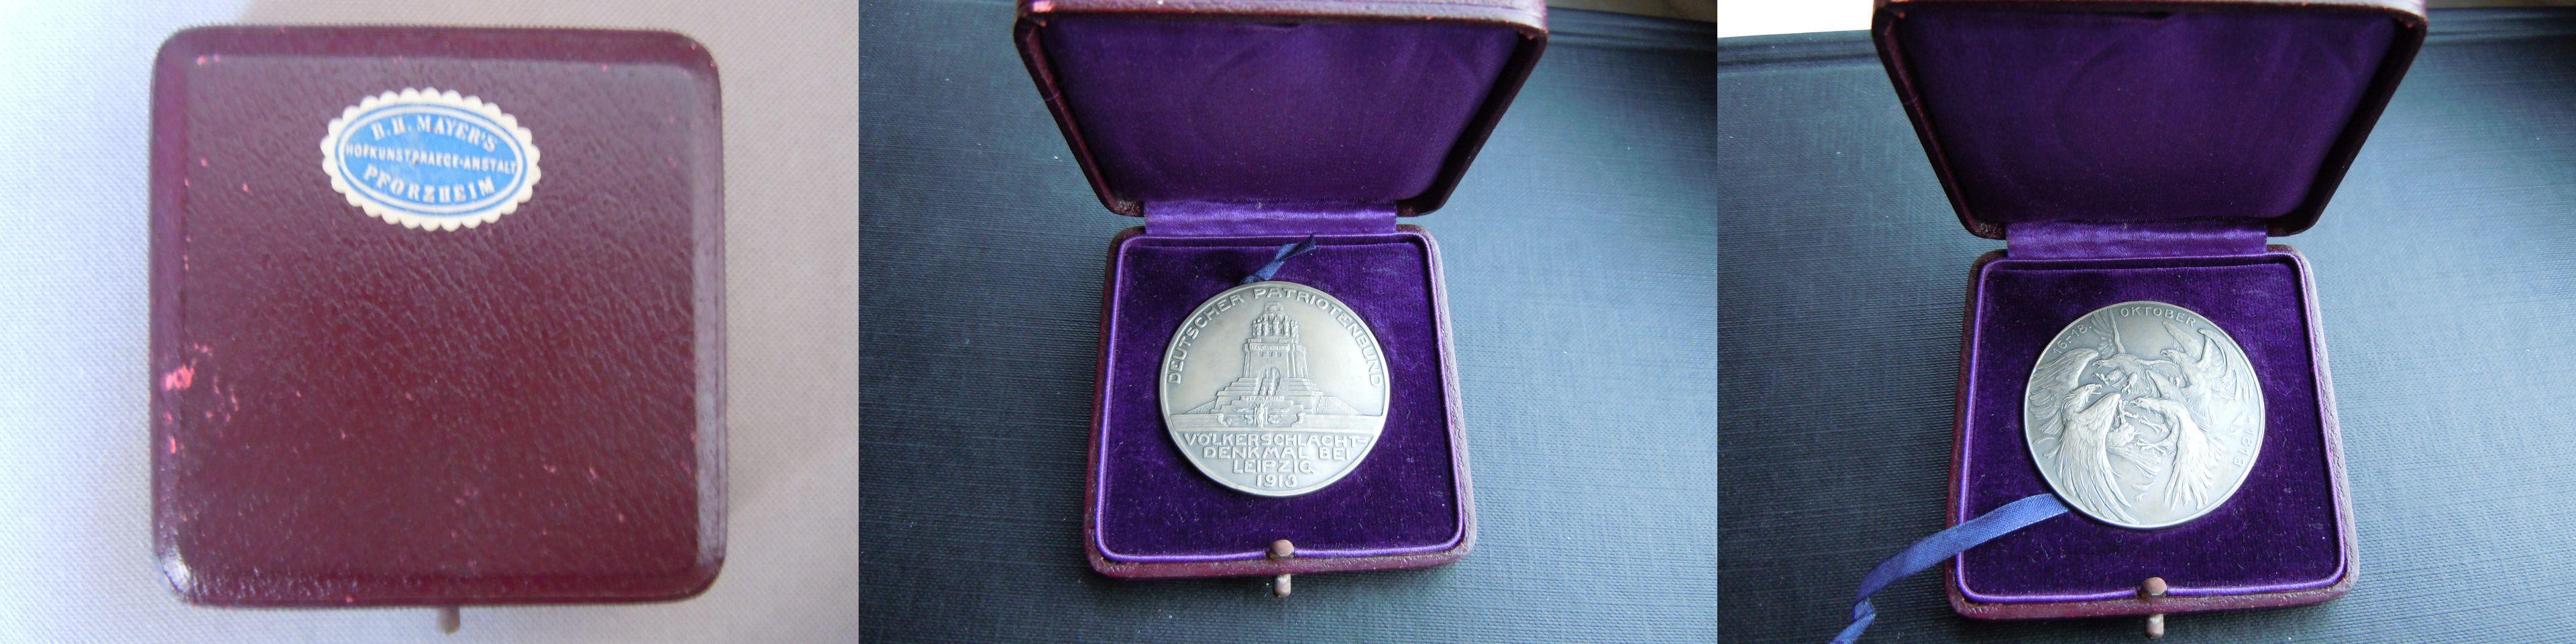 BHM Medaille bronze versilbert 1913.jpg